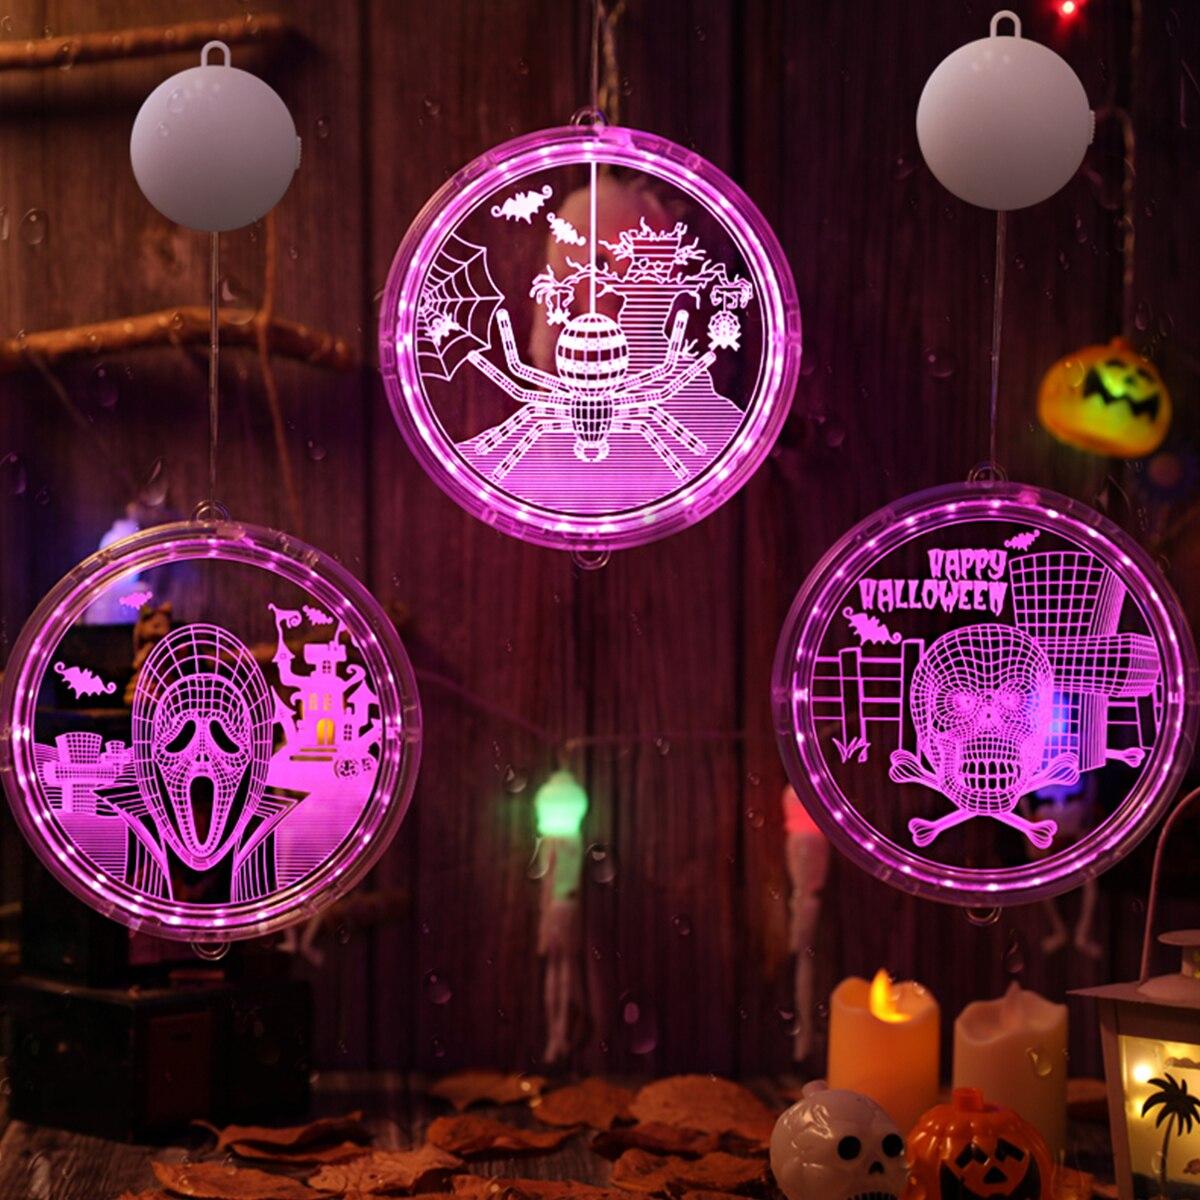 Huiran Skull Pumpkin Spider Halloween Led Light Halloween Decoration Lights For Room Decoration Horror Hallowen Party Supplies Holiday Lighting Aliexpress